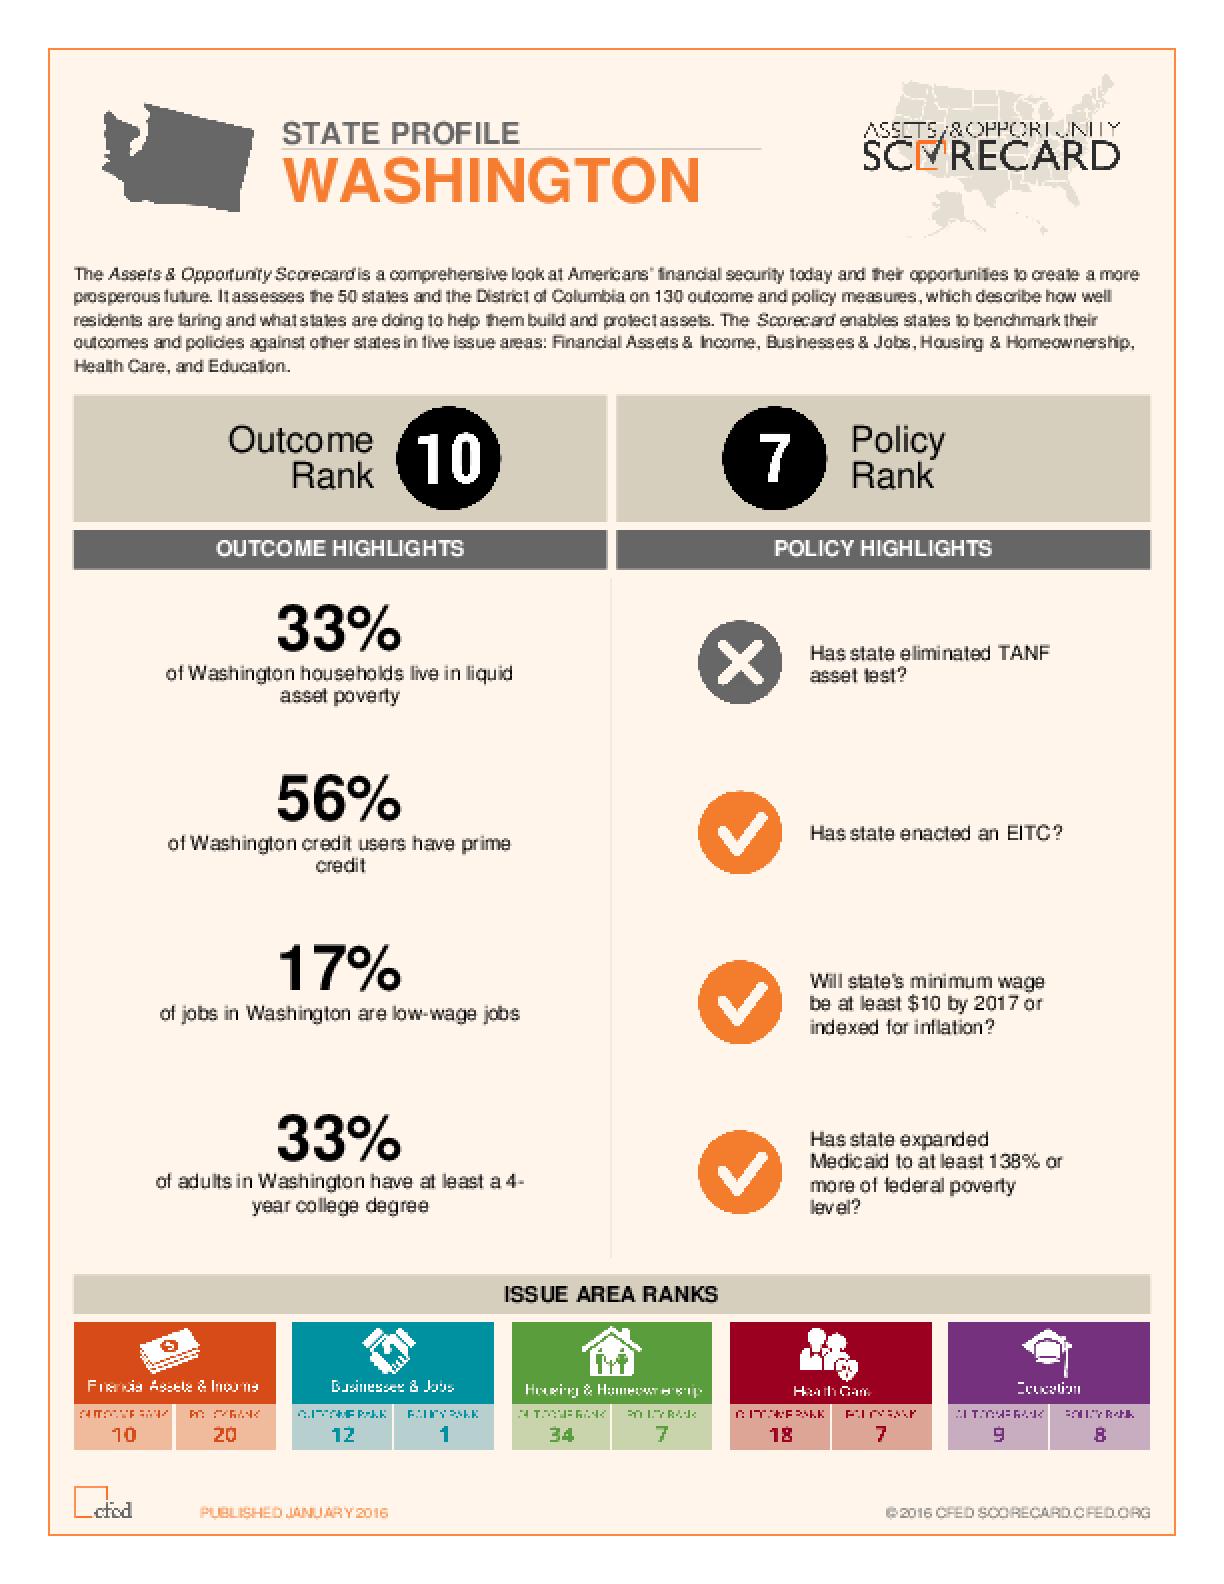 State Profile Washington: Assets and Opportunity Scorecard